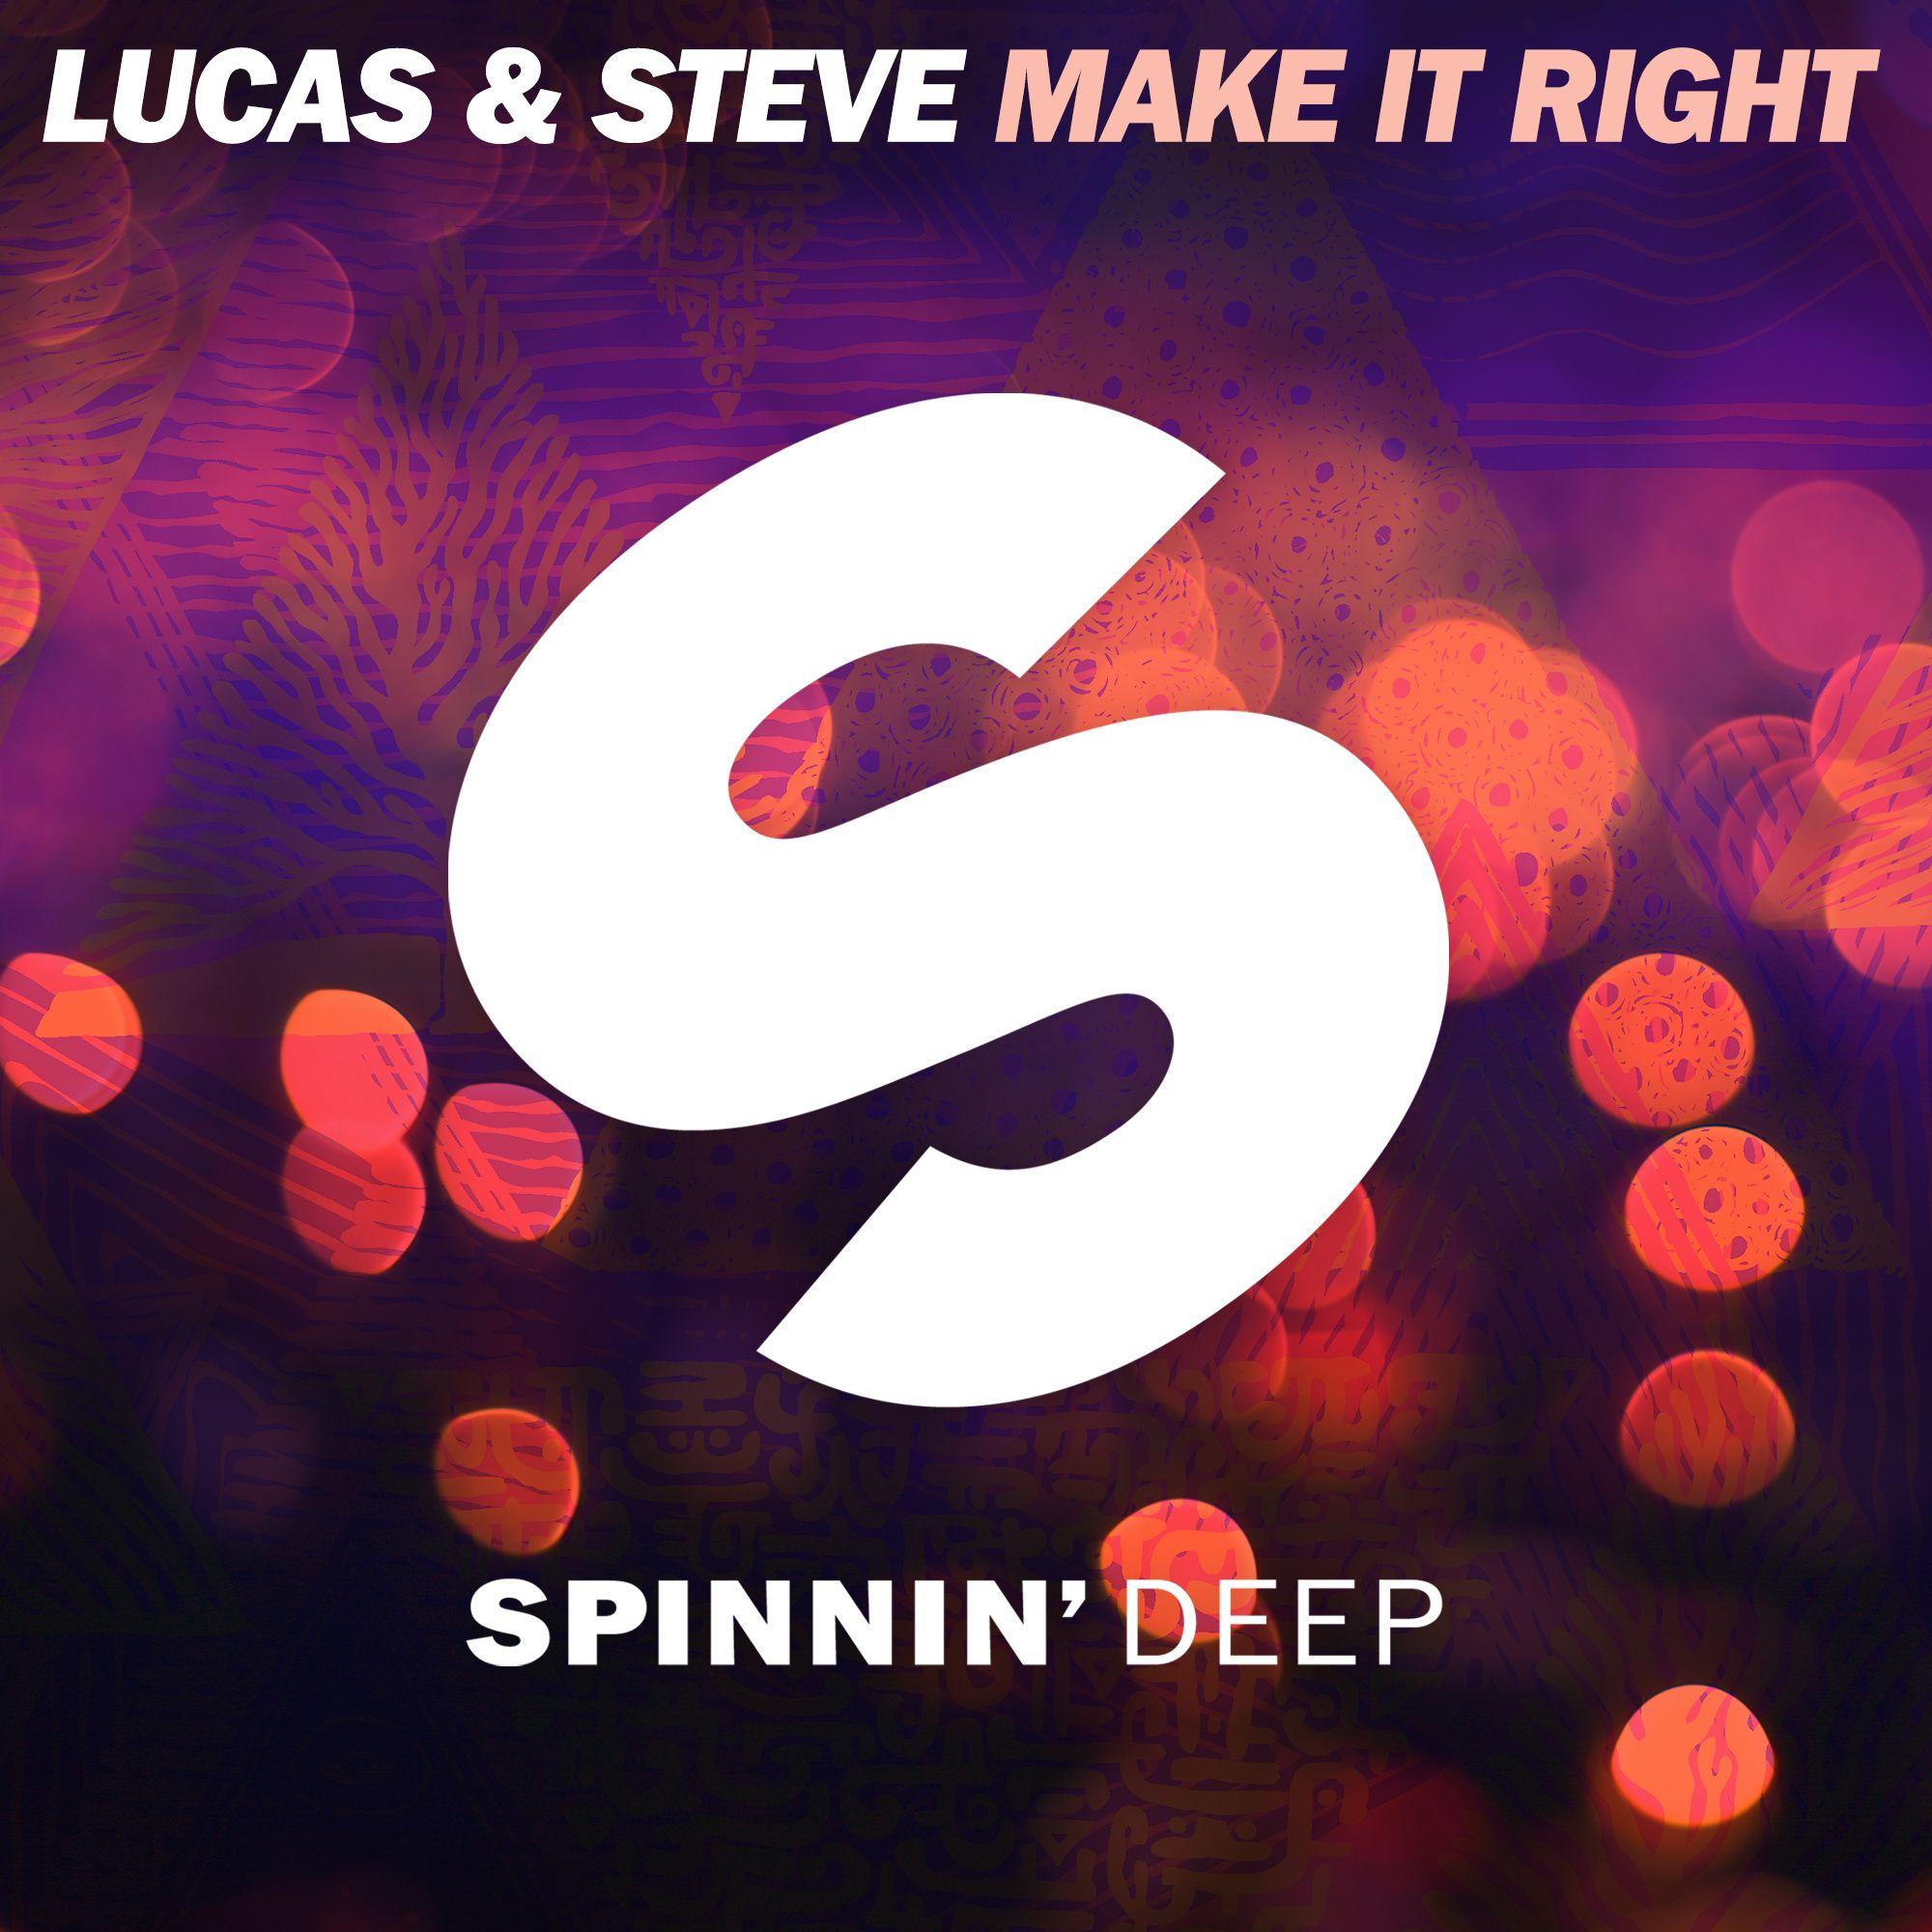 spdeep_lucas_steve_-_make_it_right.jpg